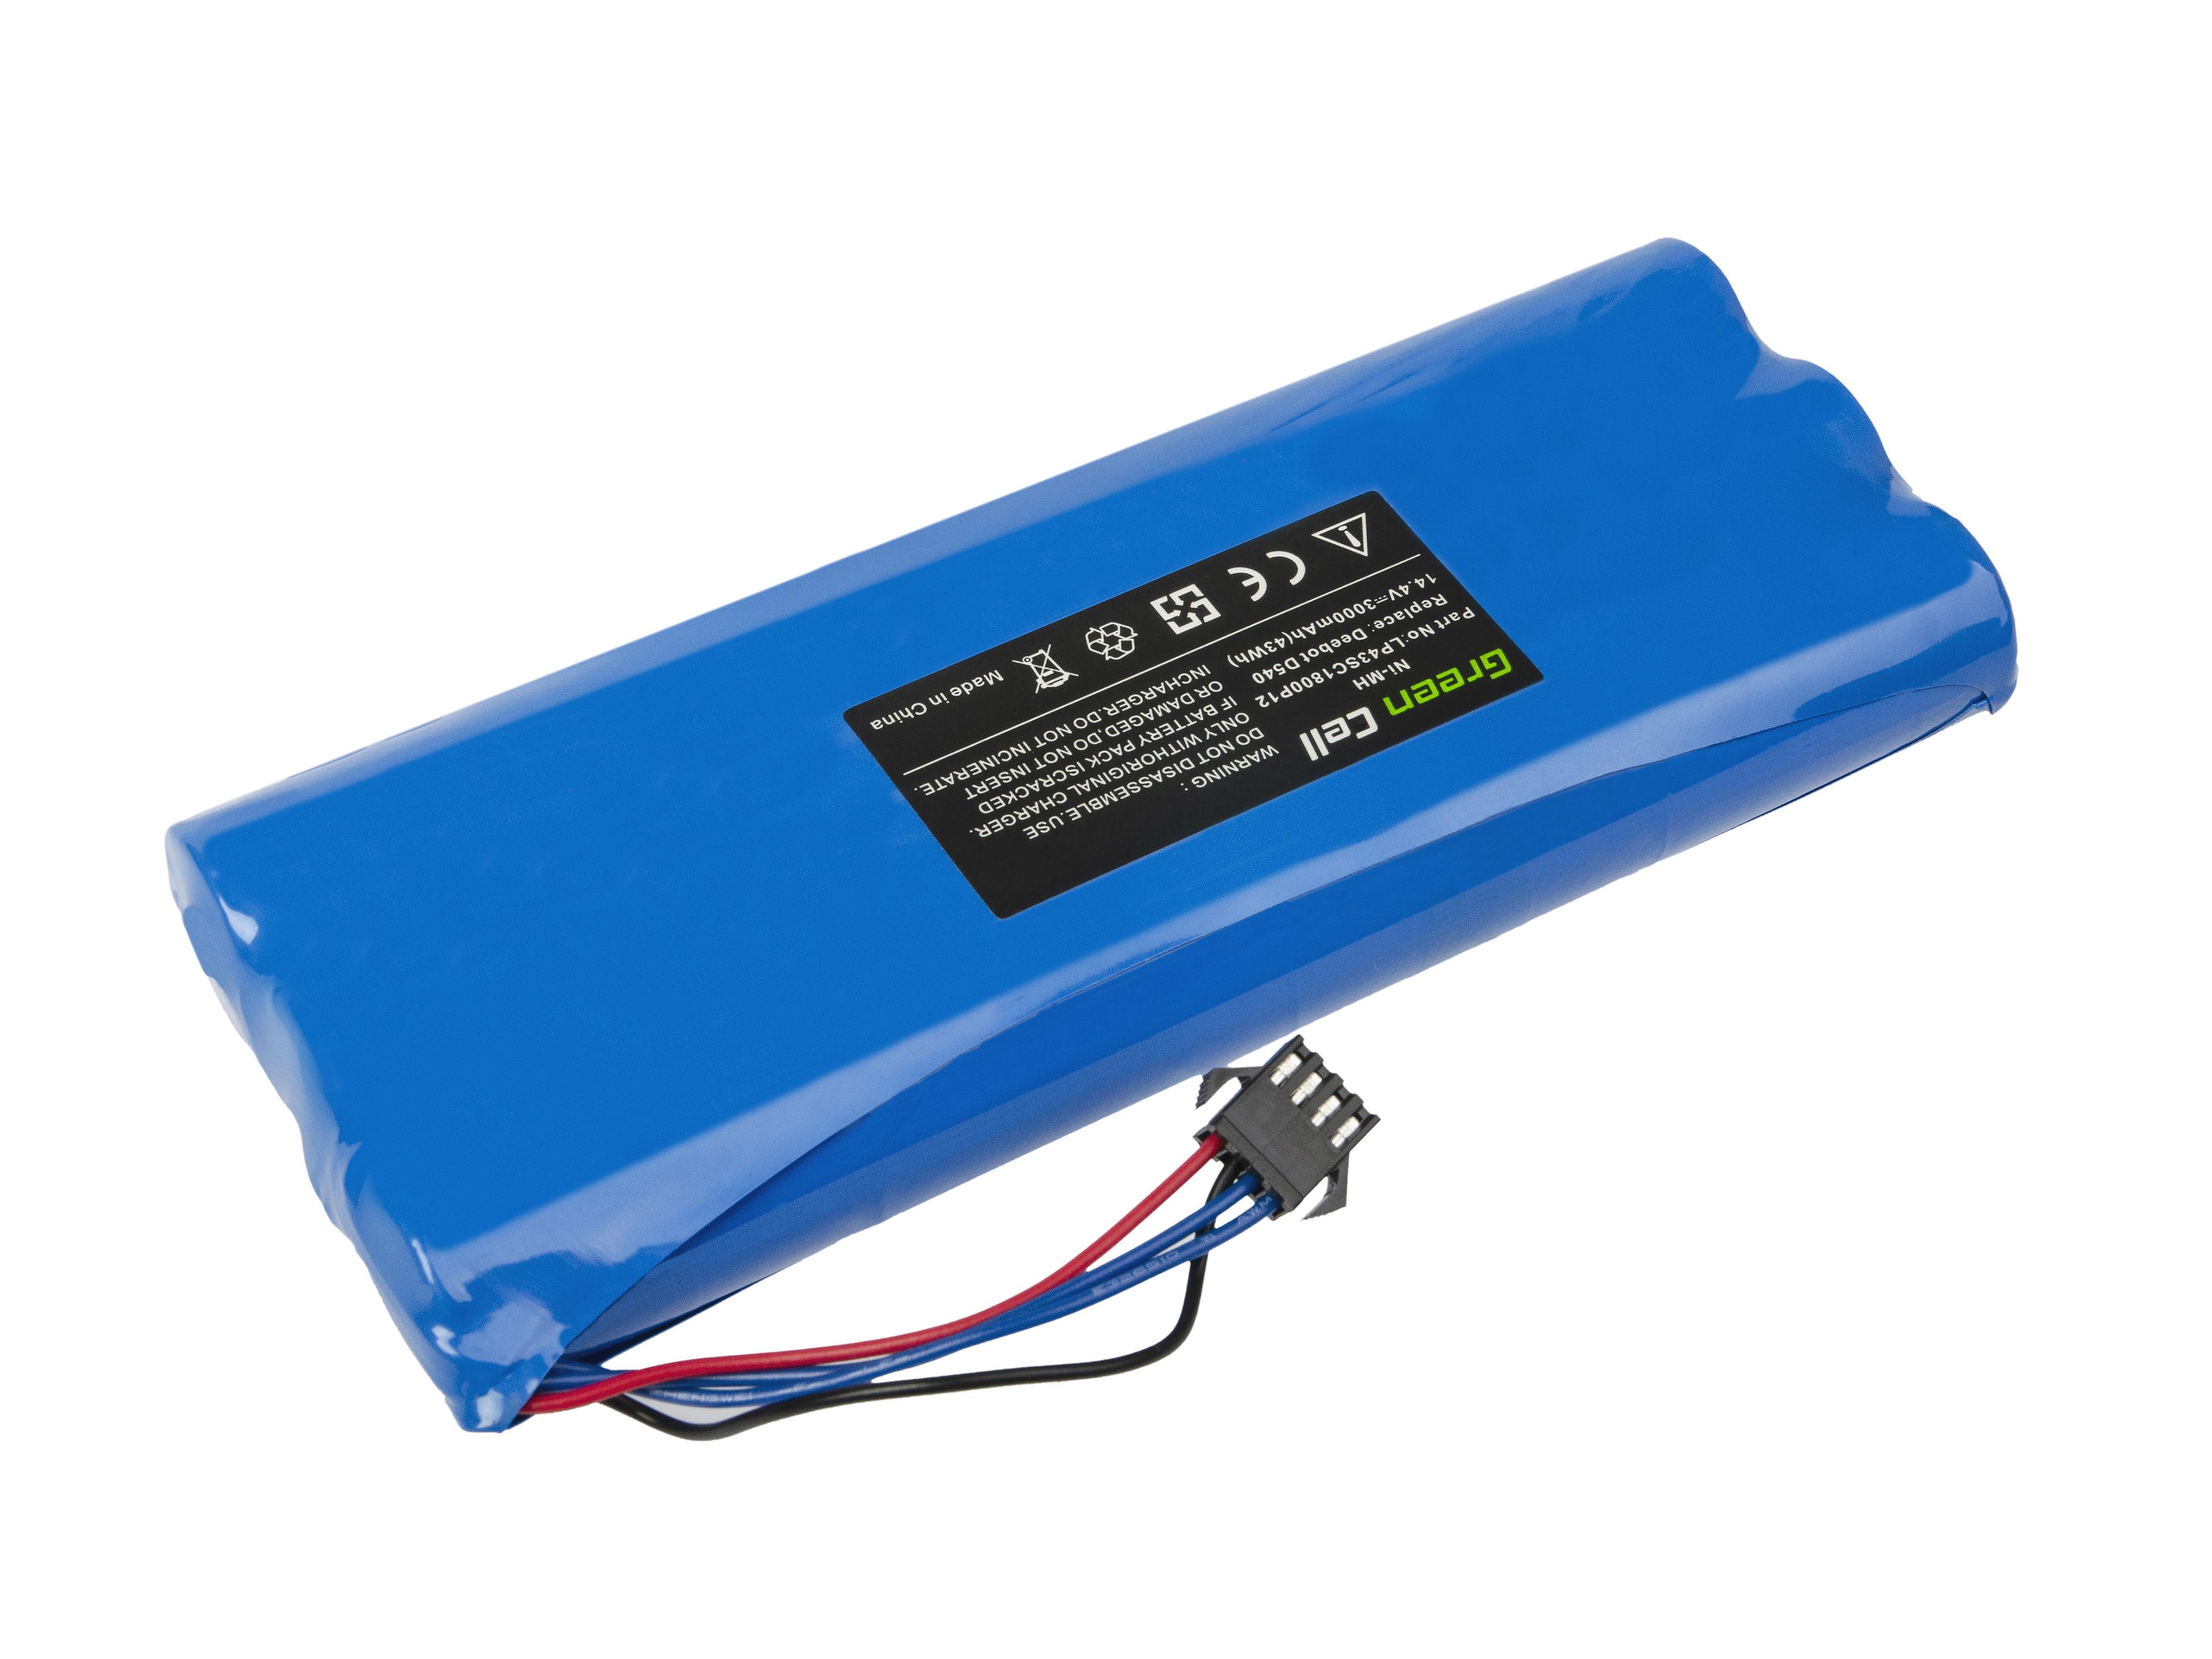 Baterie Green Cell Ecovacs Deebot D523 D540 D550 D560 D570 D580 14.4V 3000 mAh Ni-MH – neoriginální